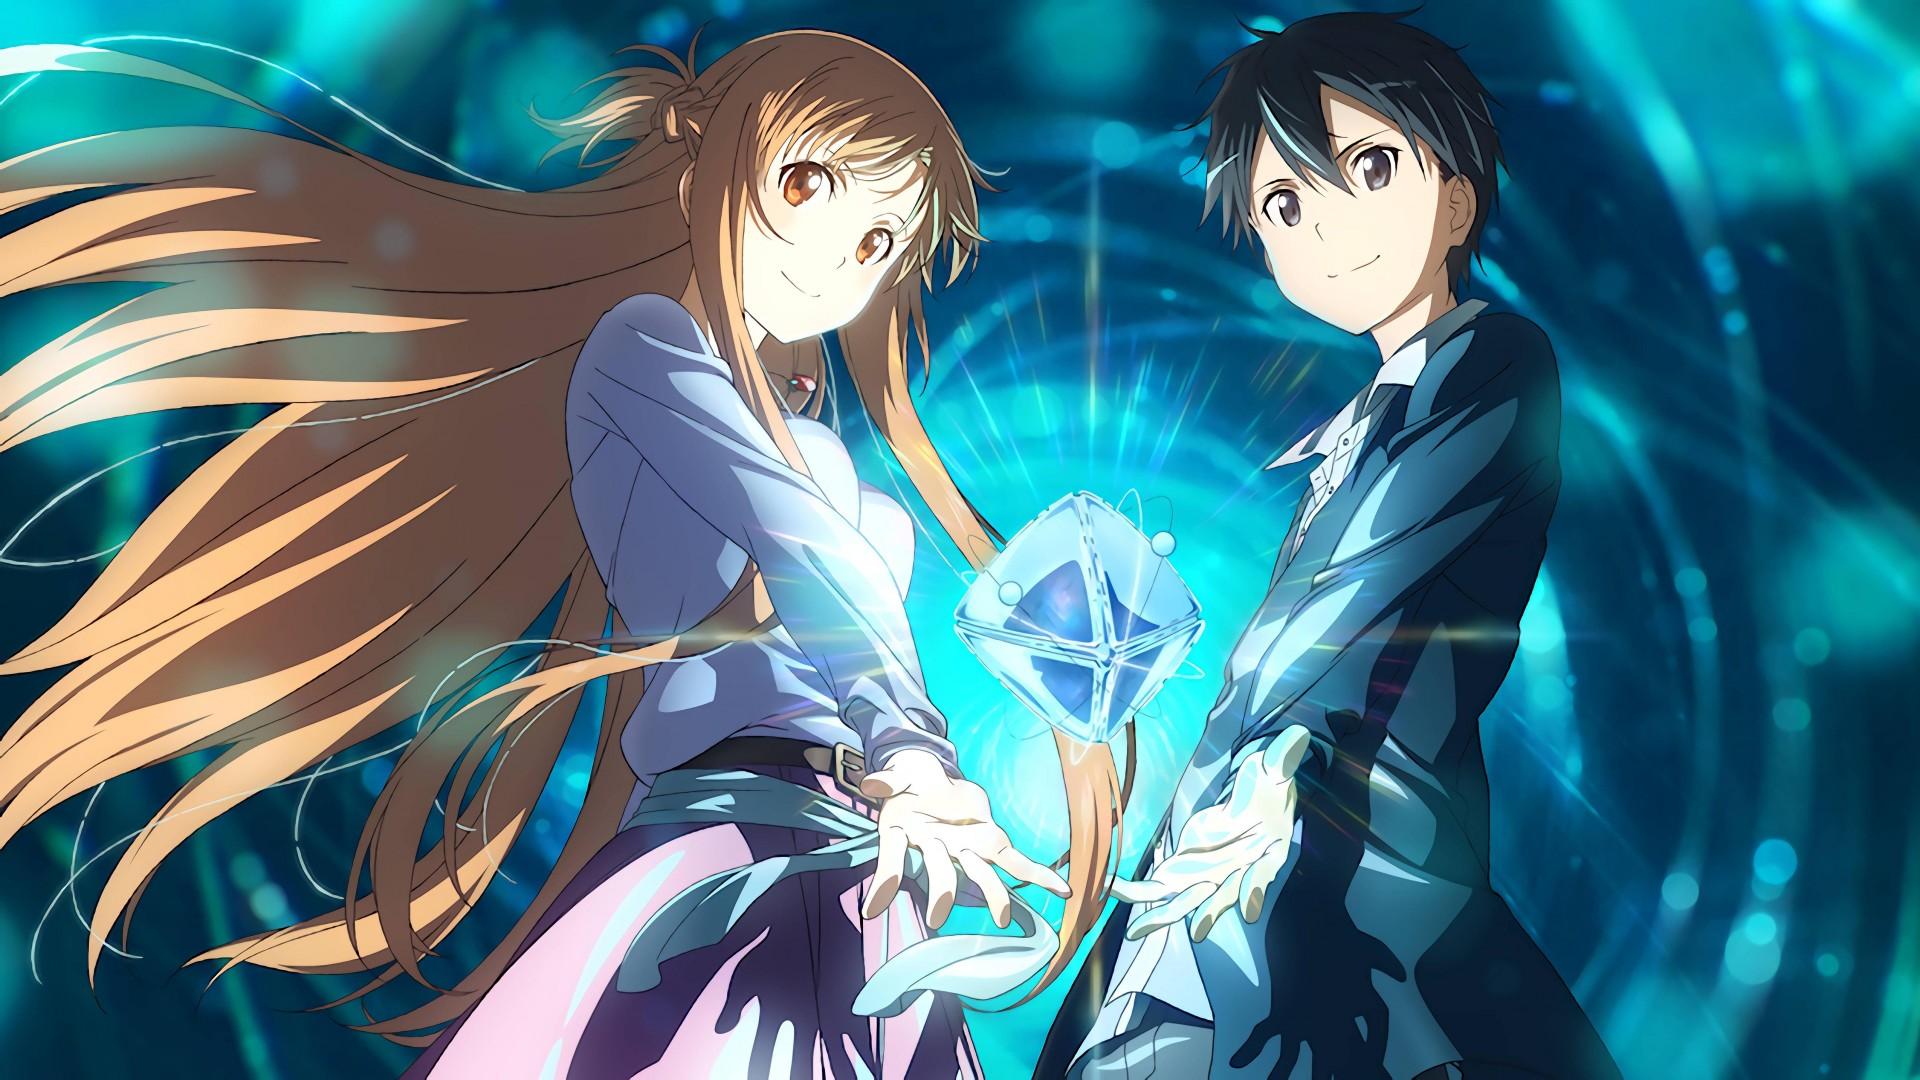 Wallpaper Anime Anime Couple Sword Art Online Movie Ordinal